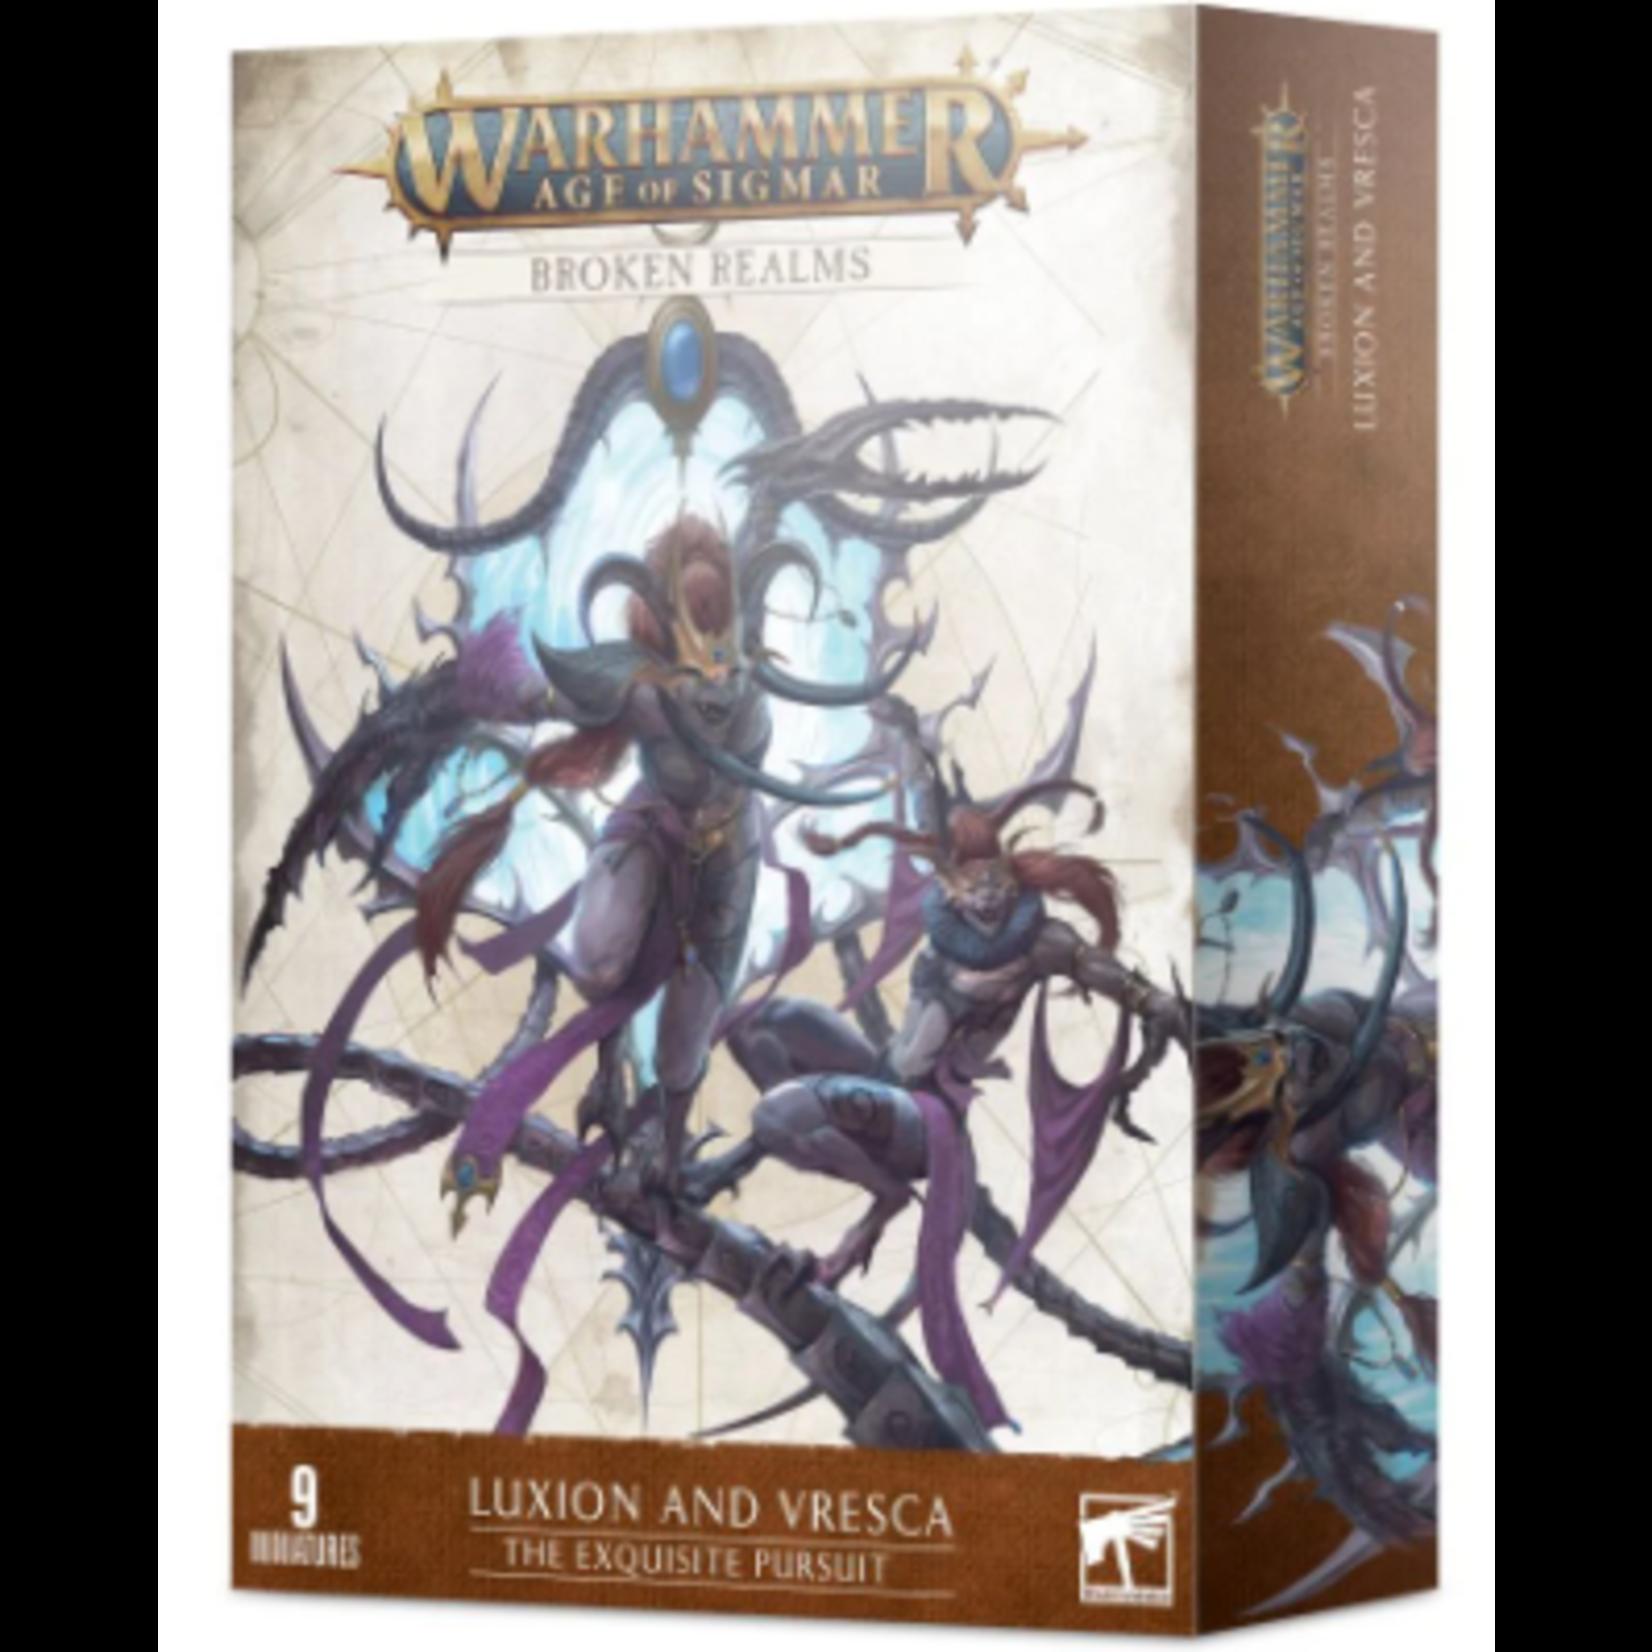 Games Workshop Warhammer Age of Sigmar: Broken Realms - The Exquisite Pursuit